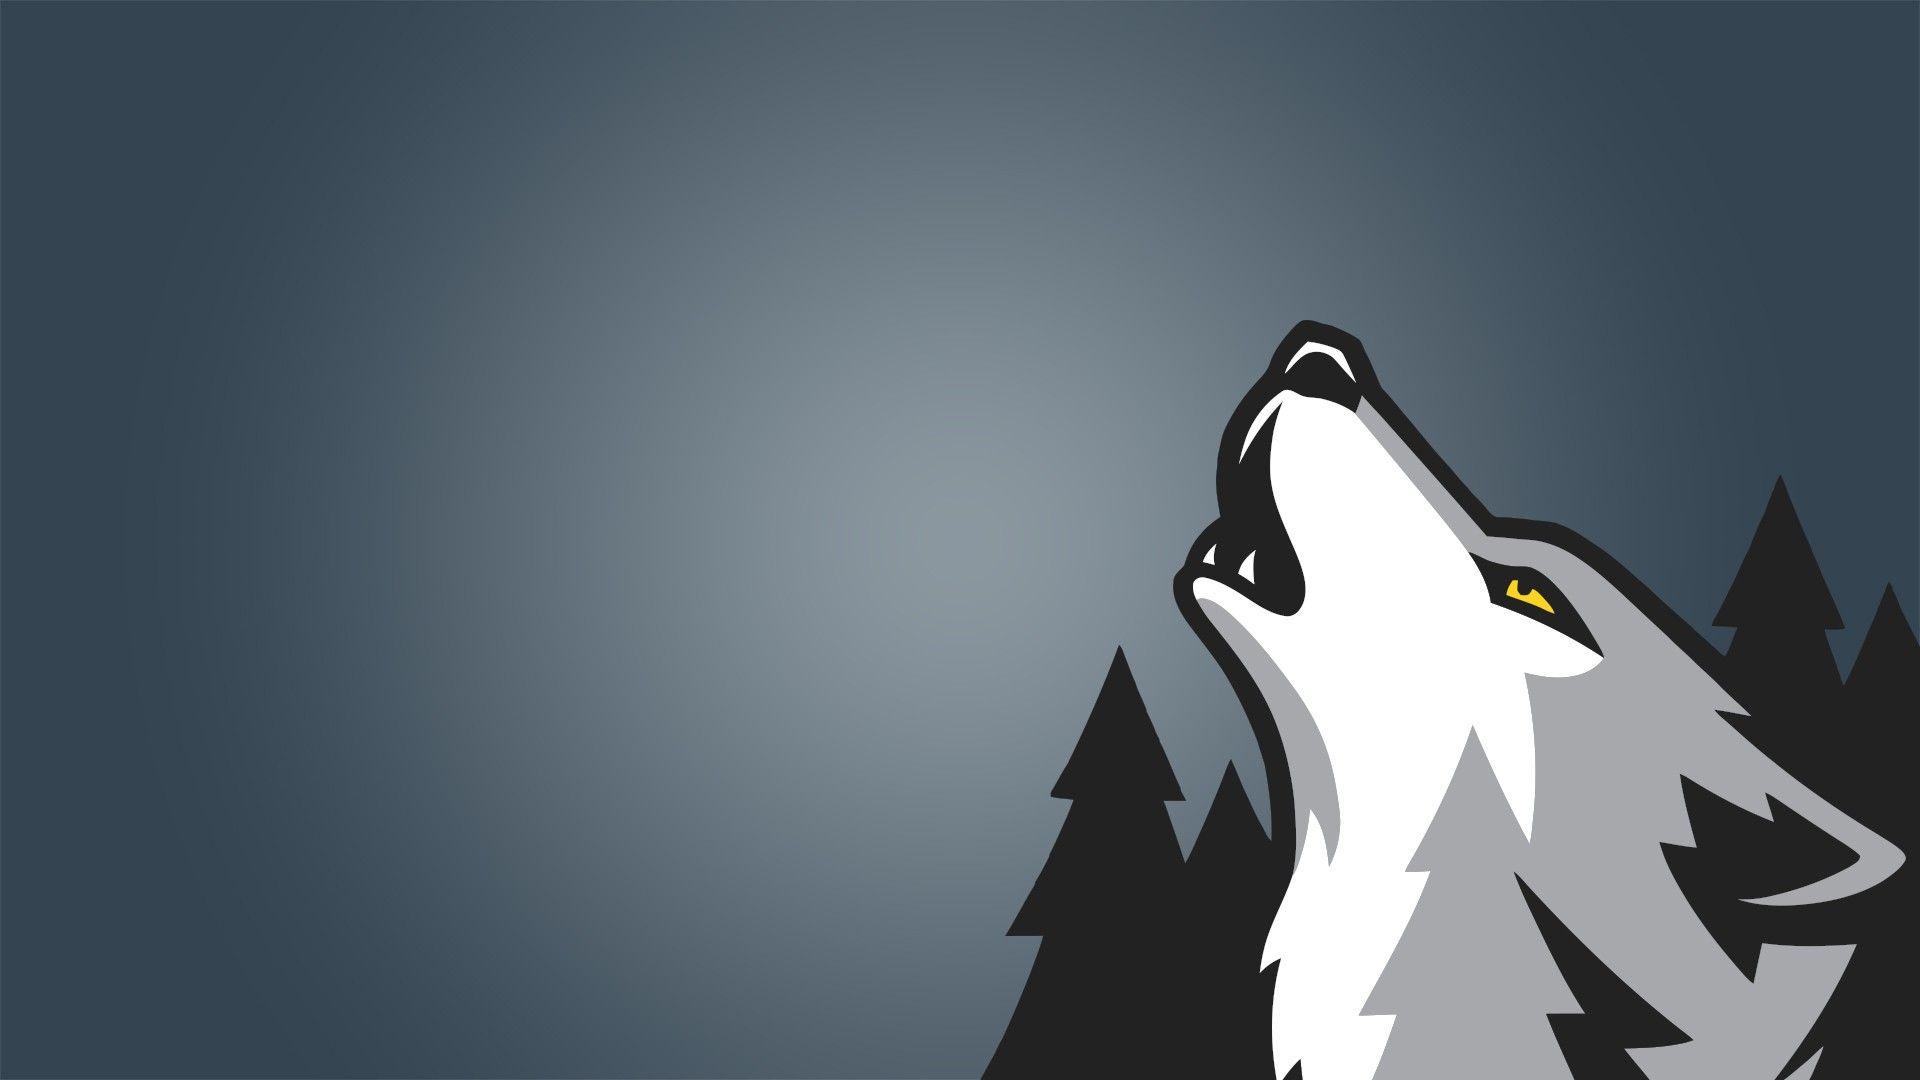 Minnesota Timberwolves wallpaper pc